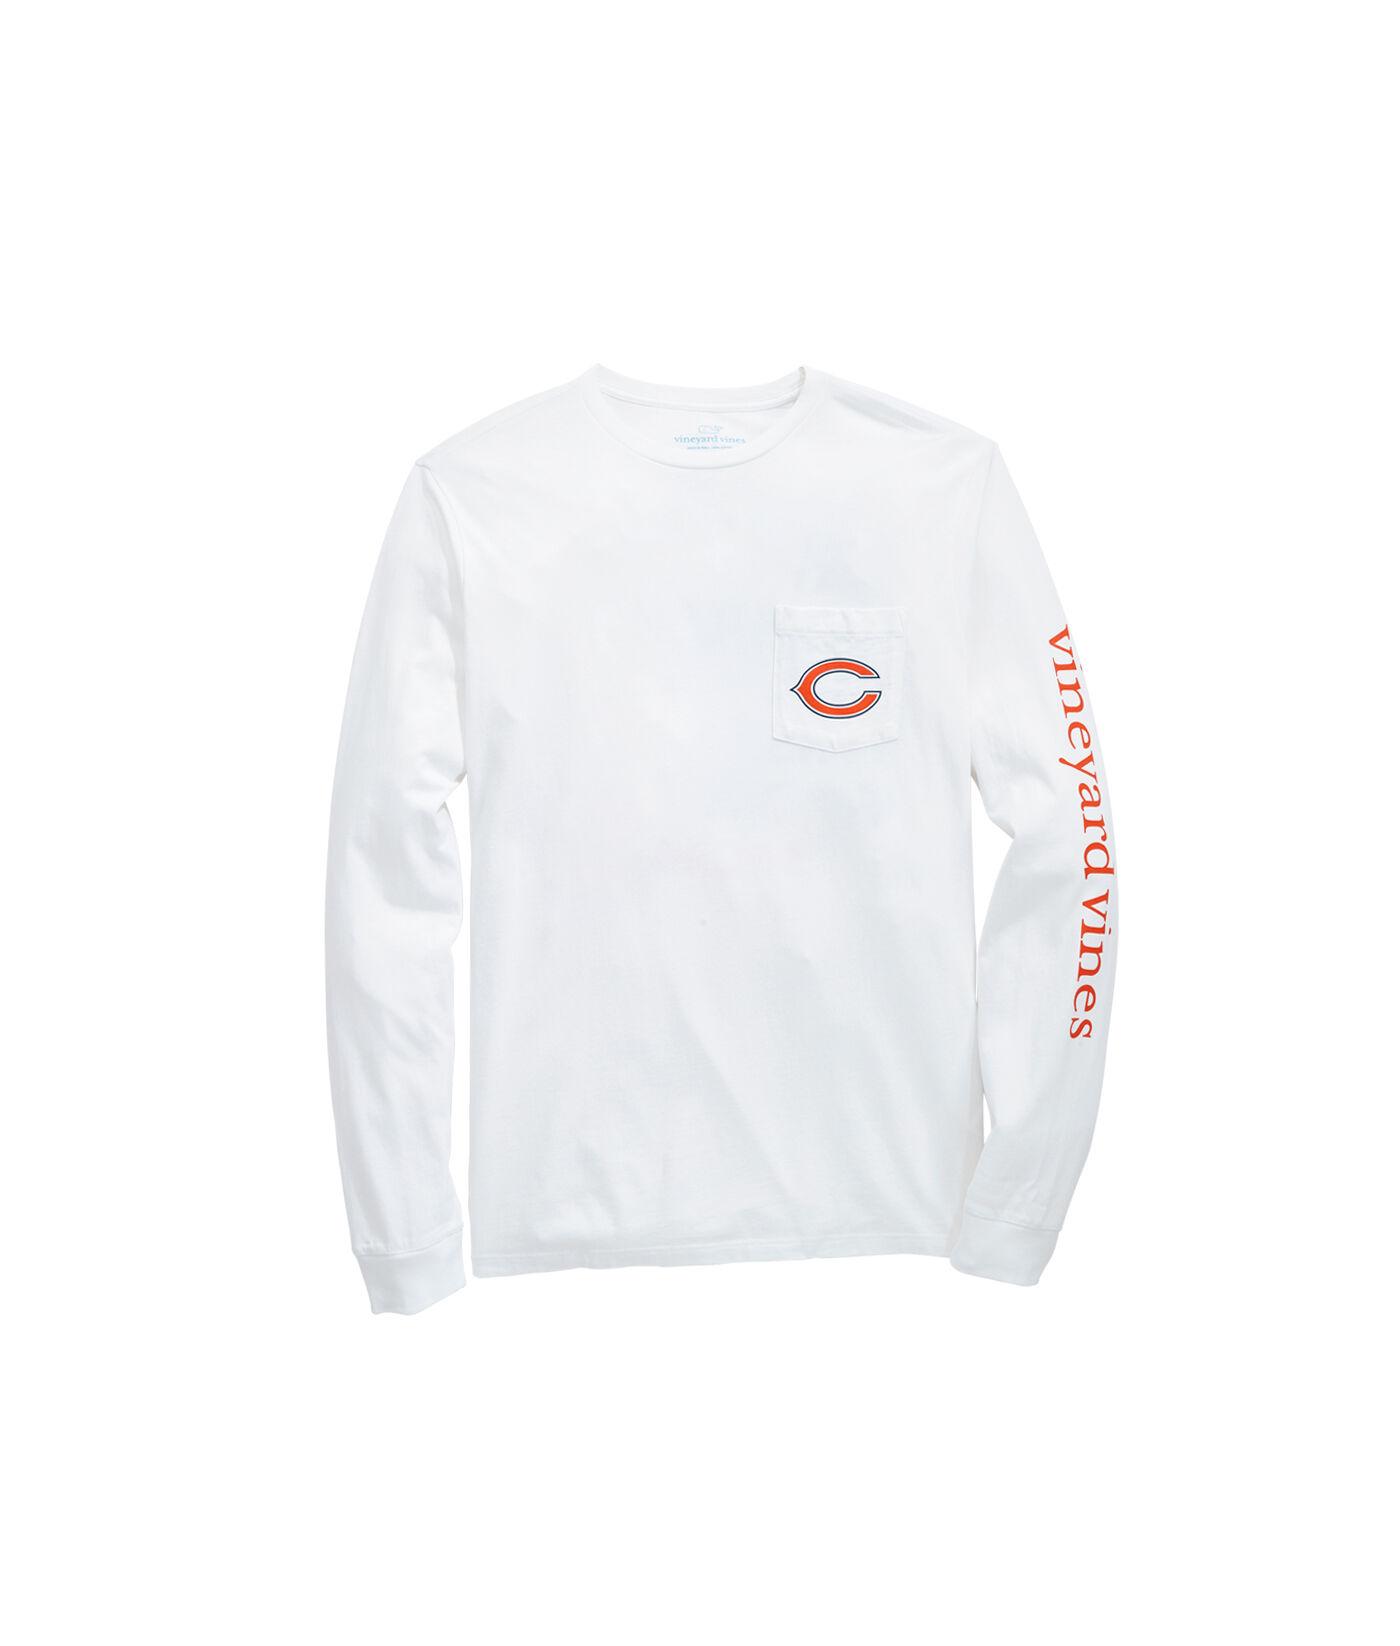 bears long sleeve shirt